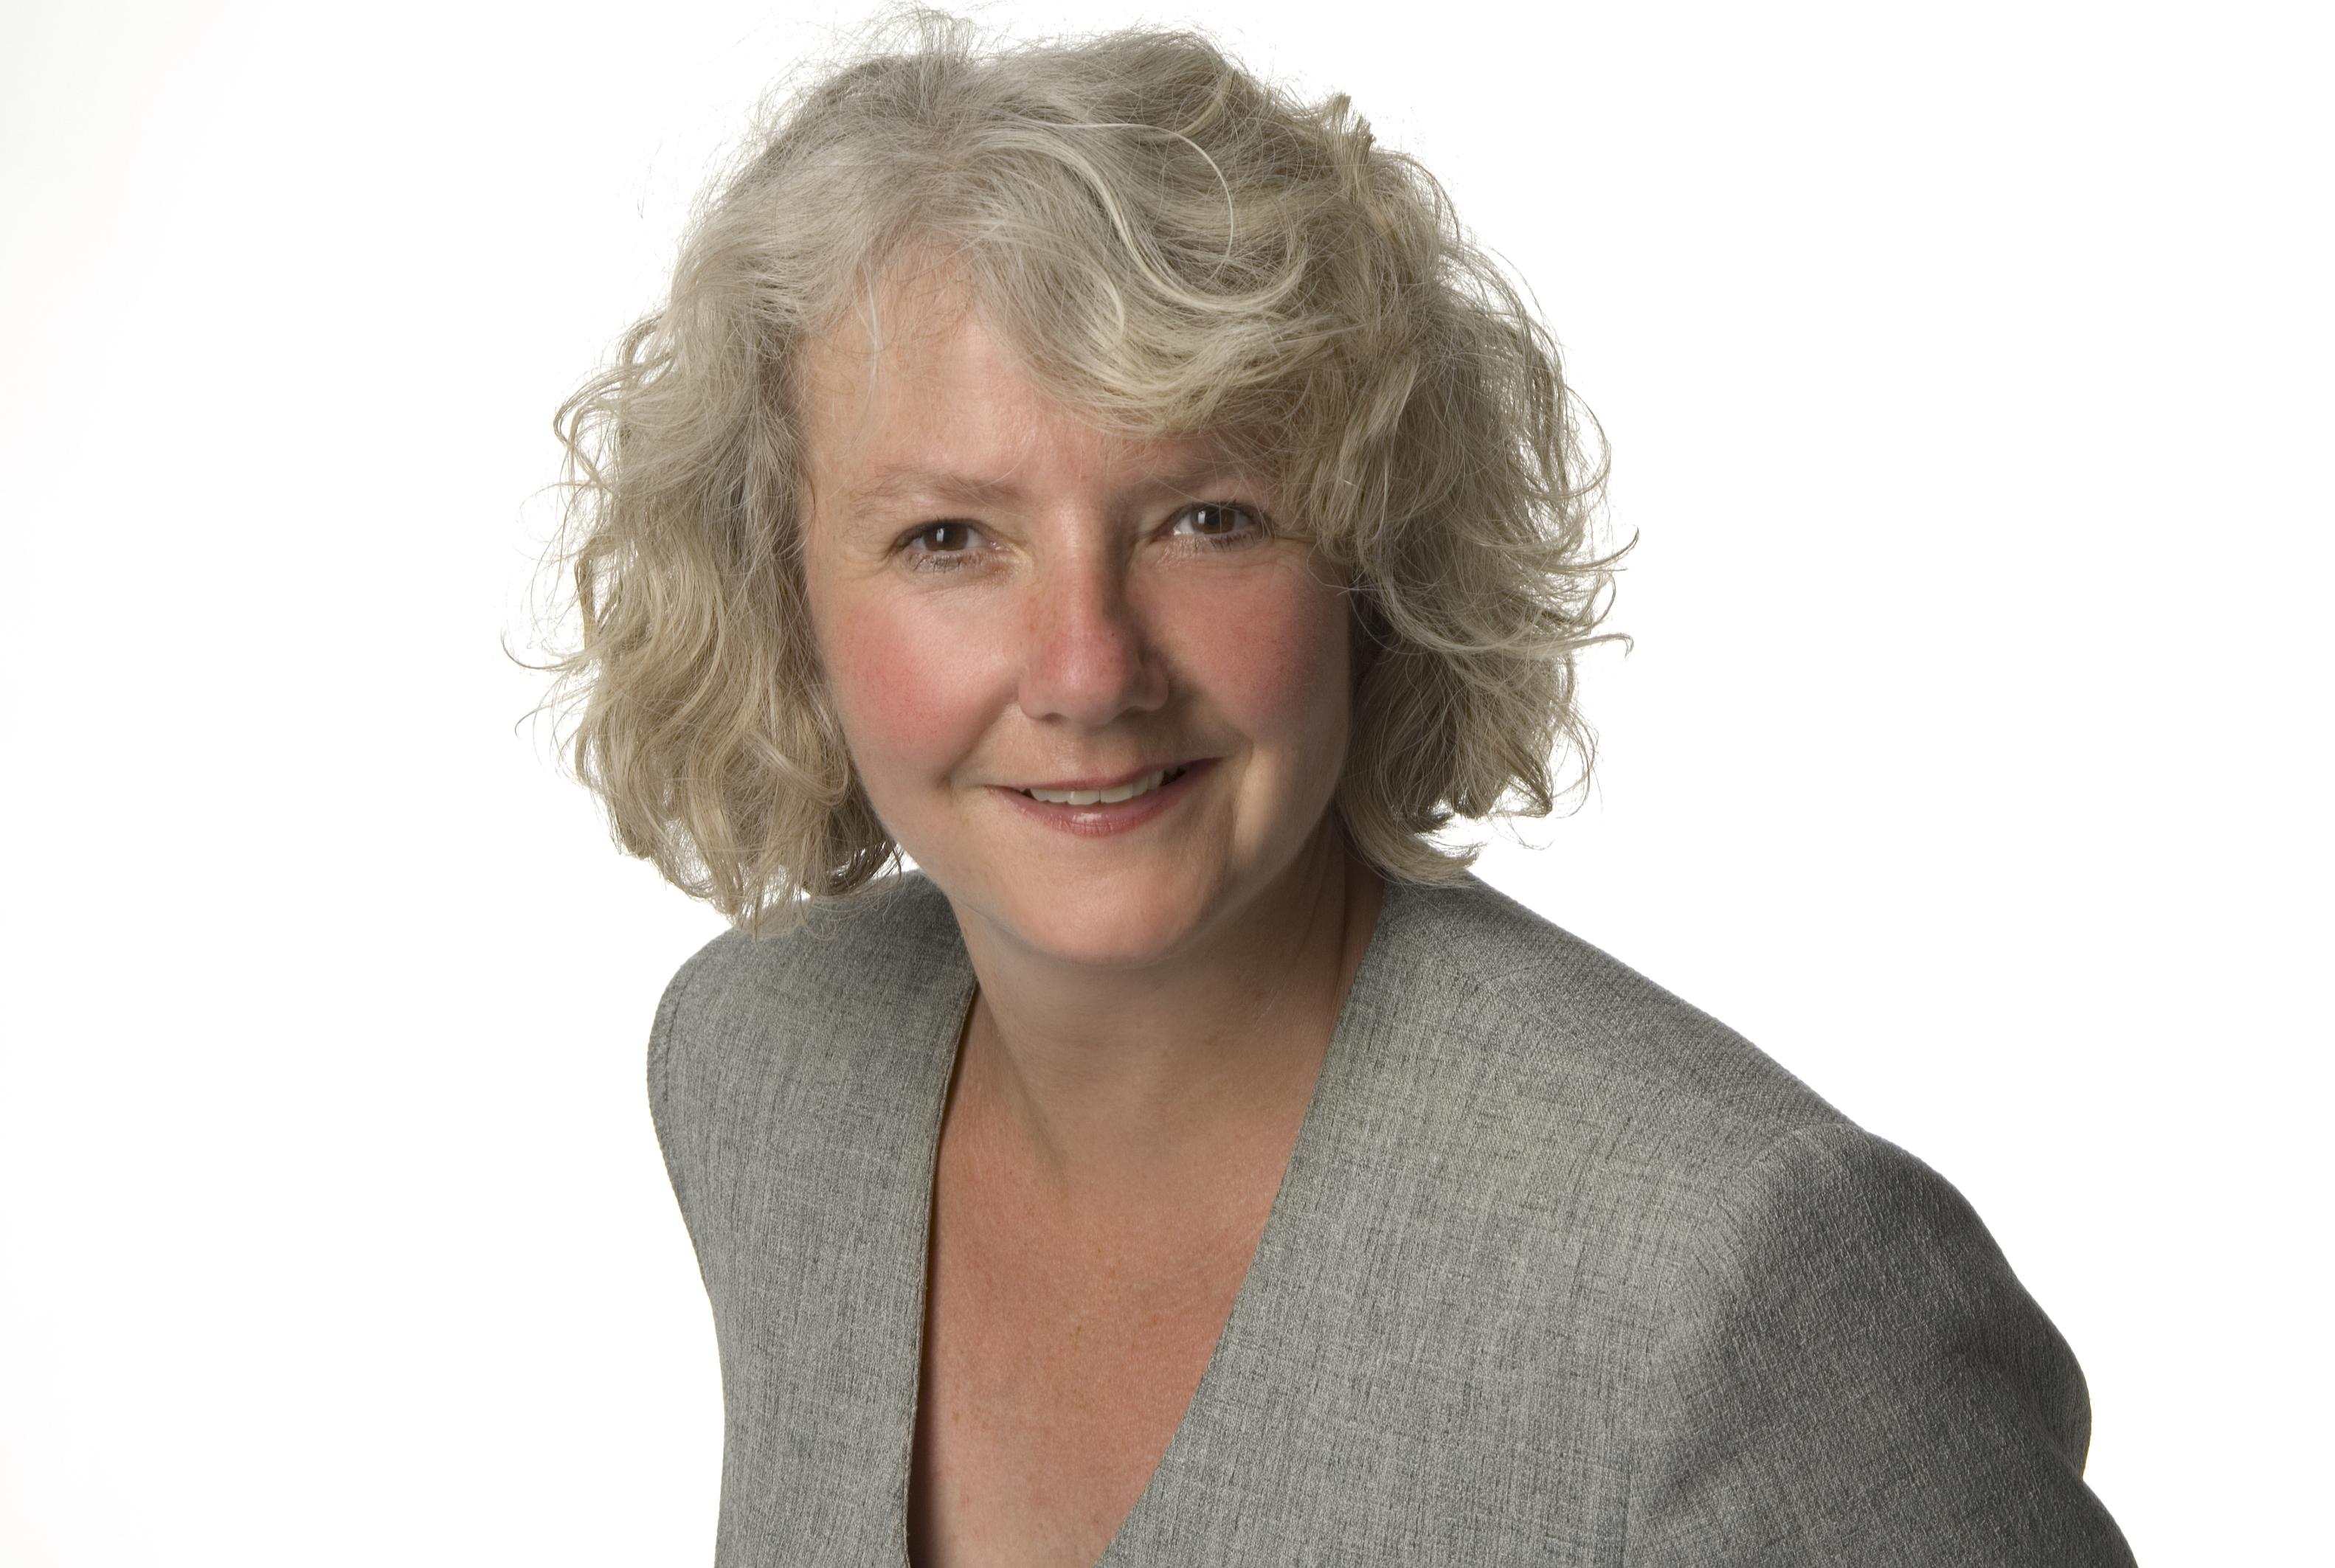 Bettina Schnitzler